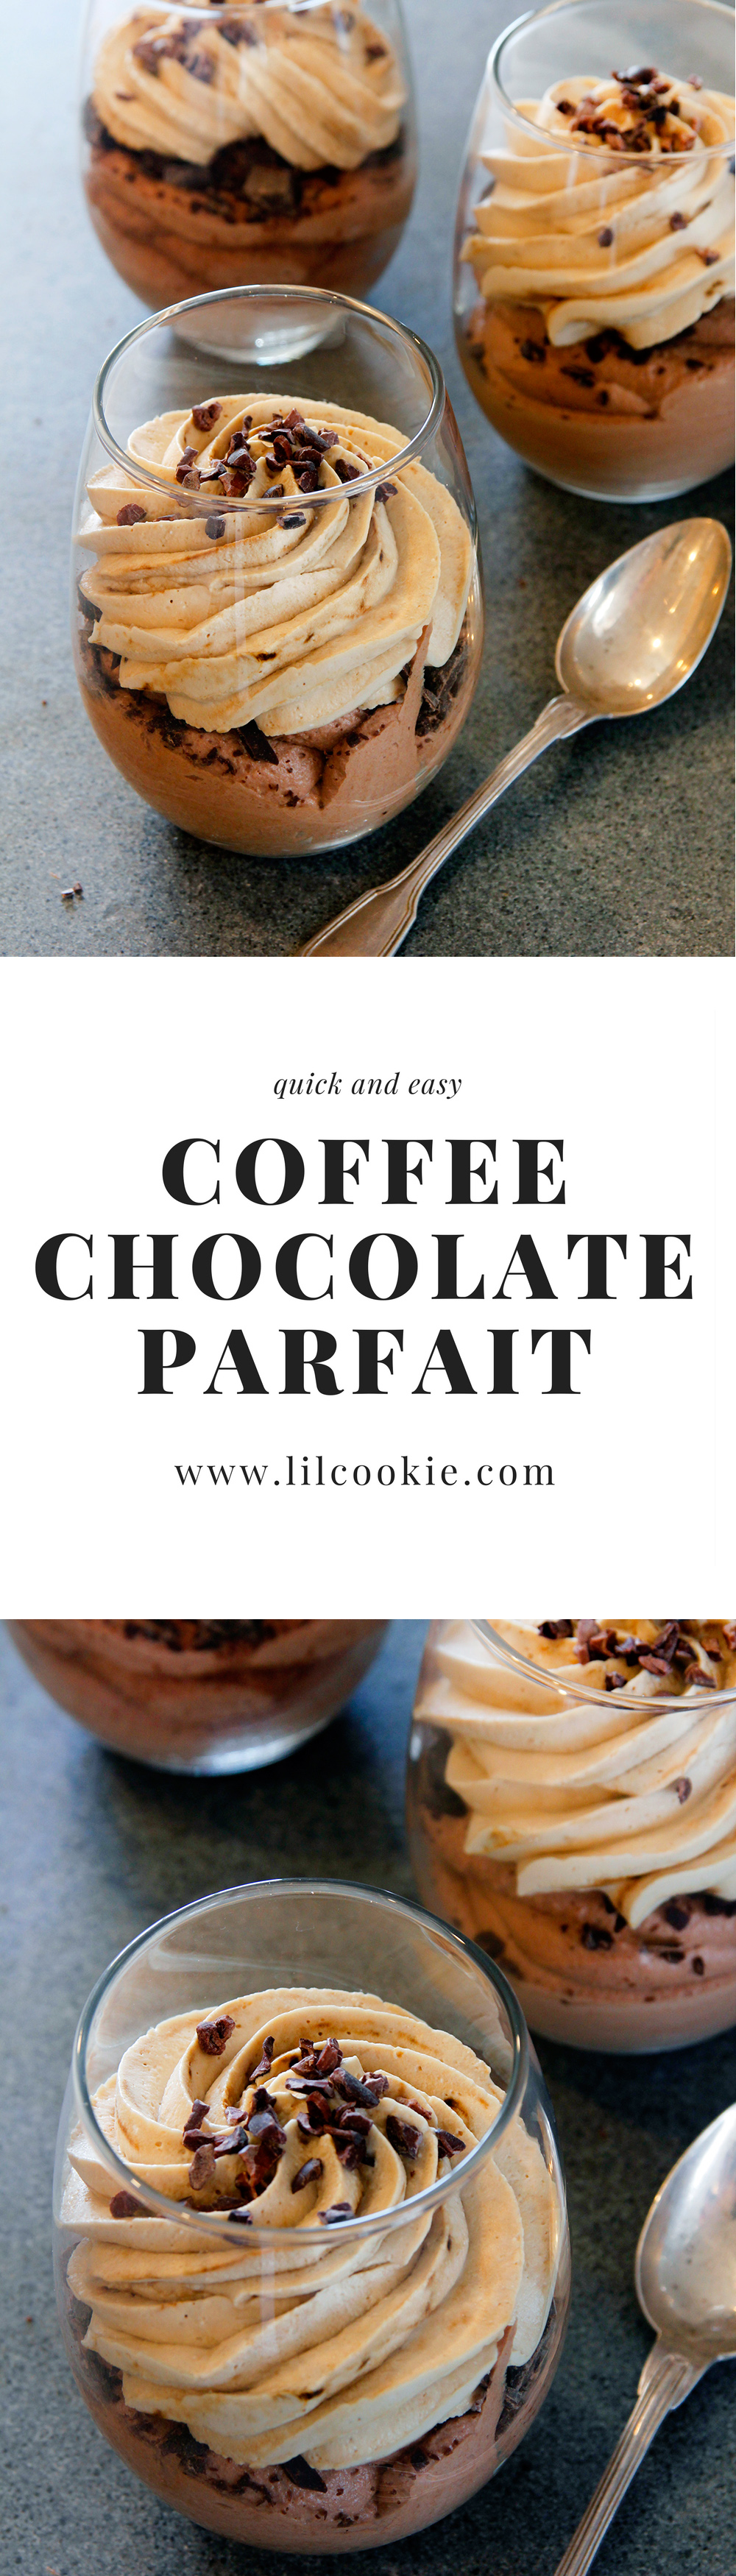 Coffee Chocolate Parfait Lil Cookie